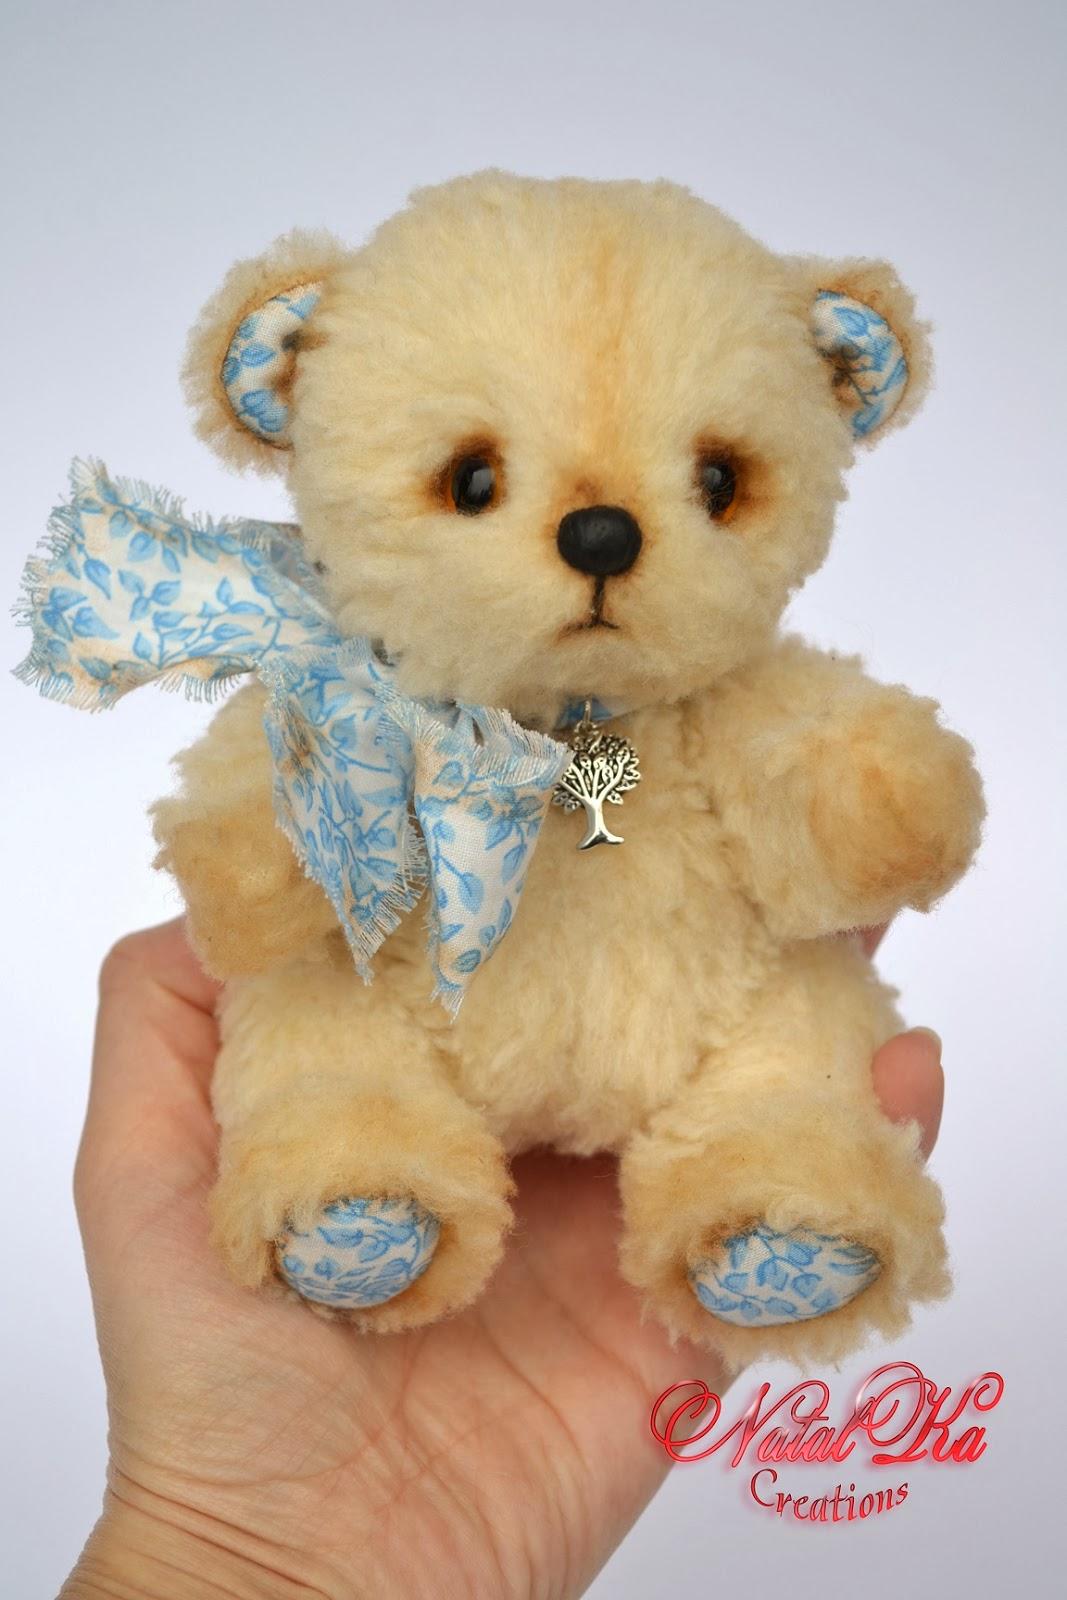 Artist teddy bear handmade by NatalKa Creations. Автрский мишка тедди ручной работы от NatalKa Creations.